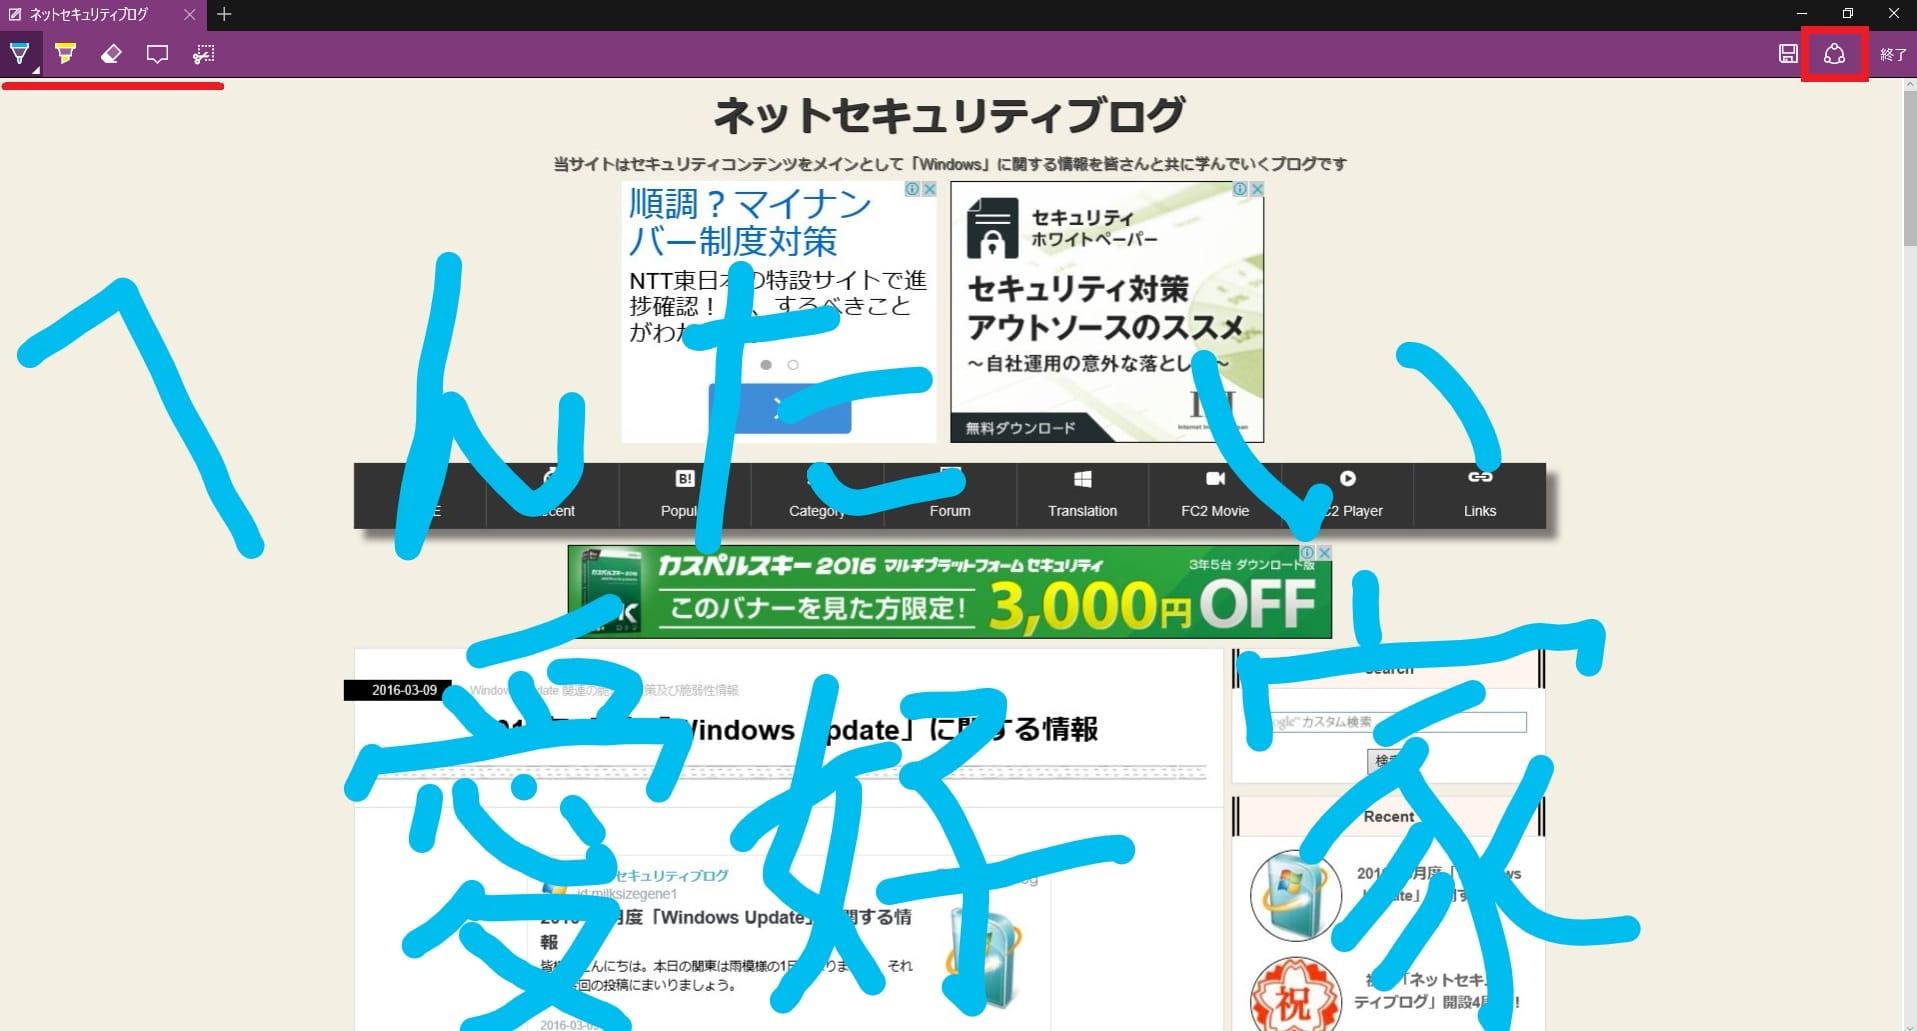 http://art9.photozou.jp/pub/119/2912119/photo/234182734_org.v1457524312.jpg